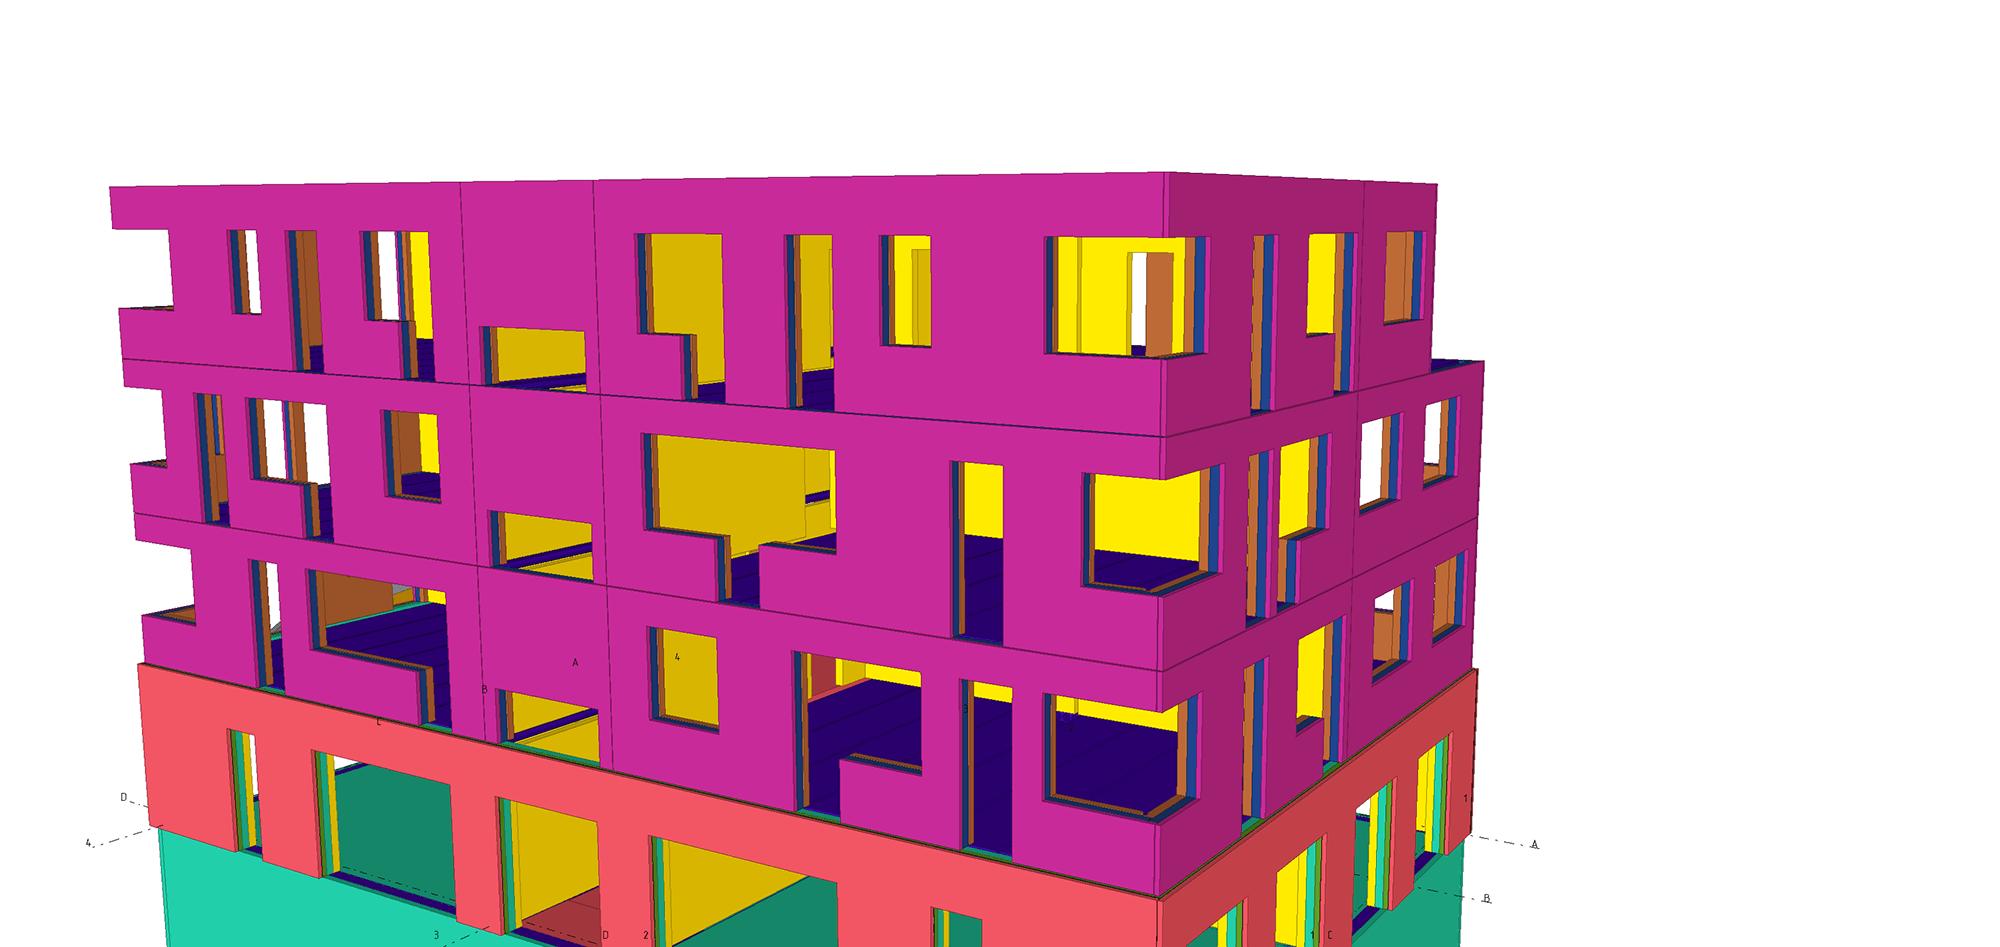 Tekla training concrete model